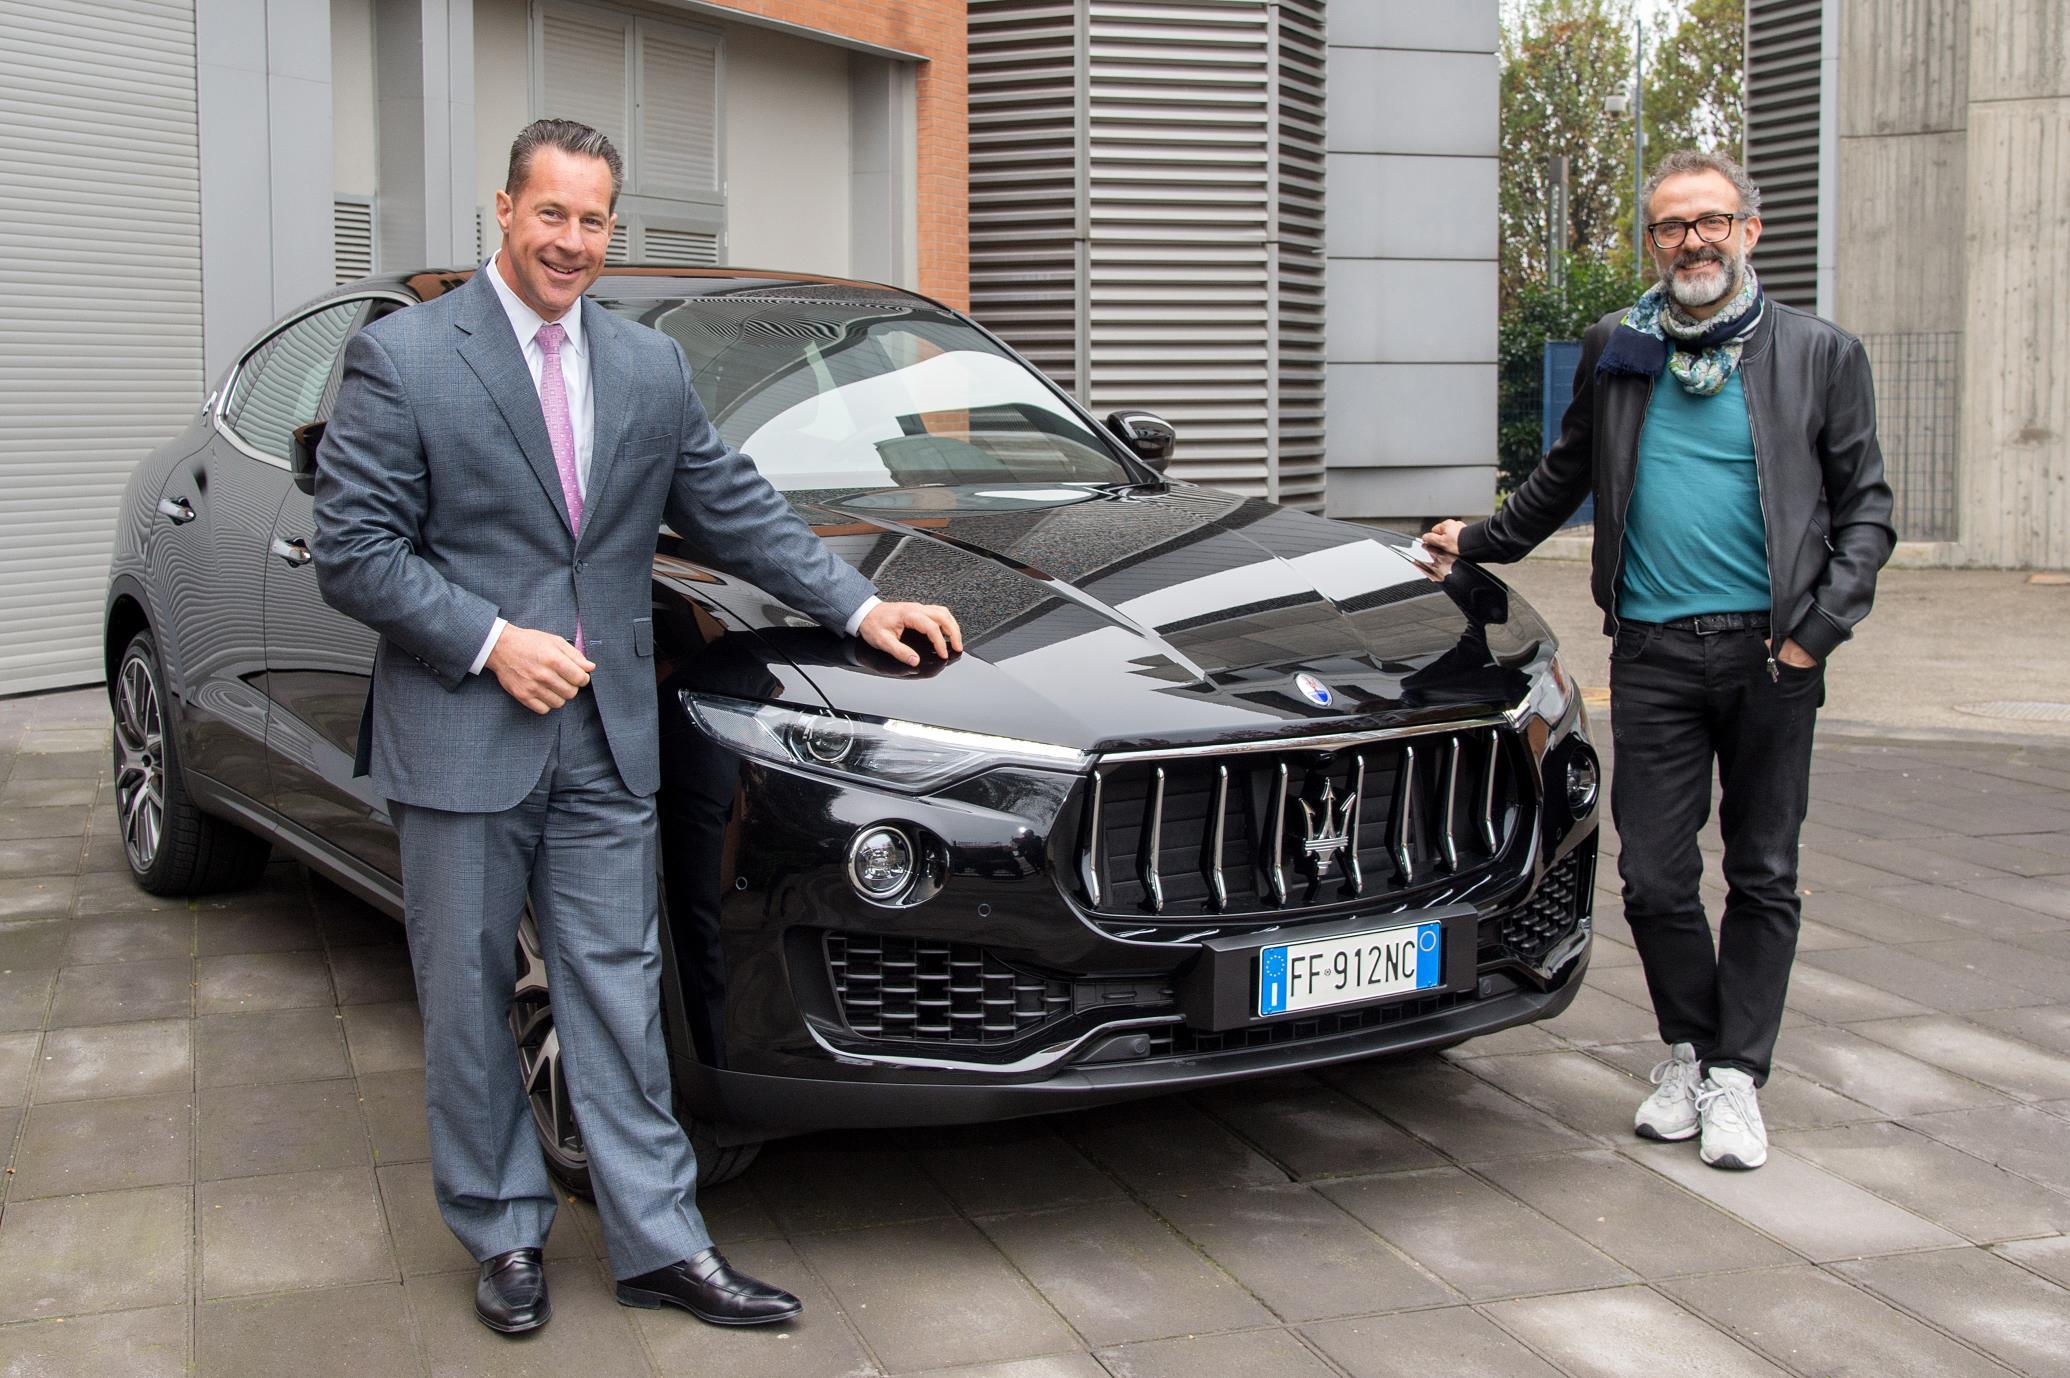 Chef Massimo Bottura Renews His Maserati Ambassadorship